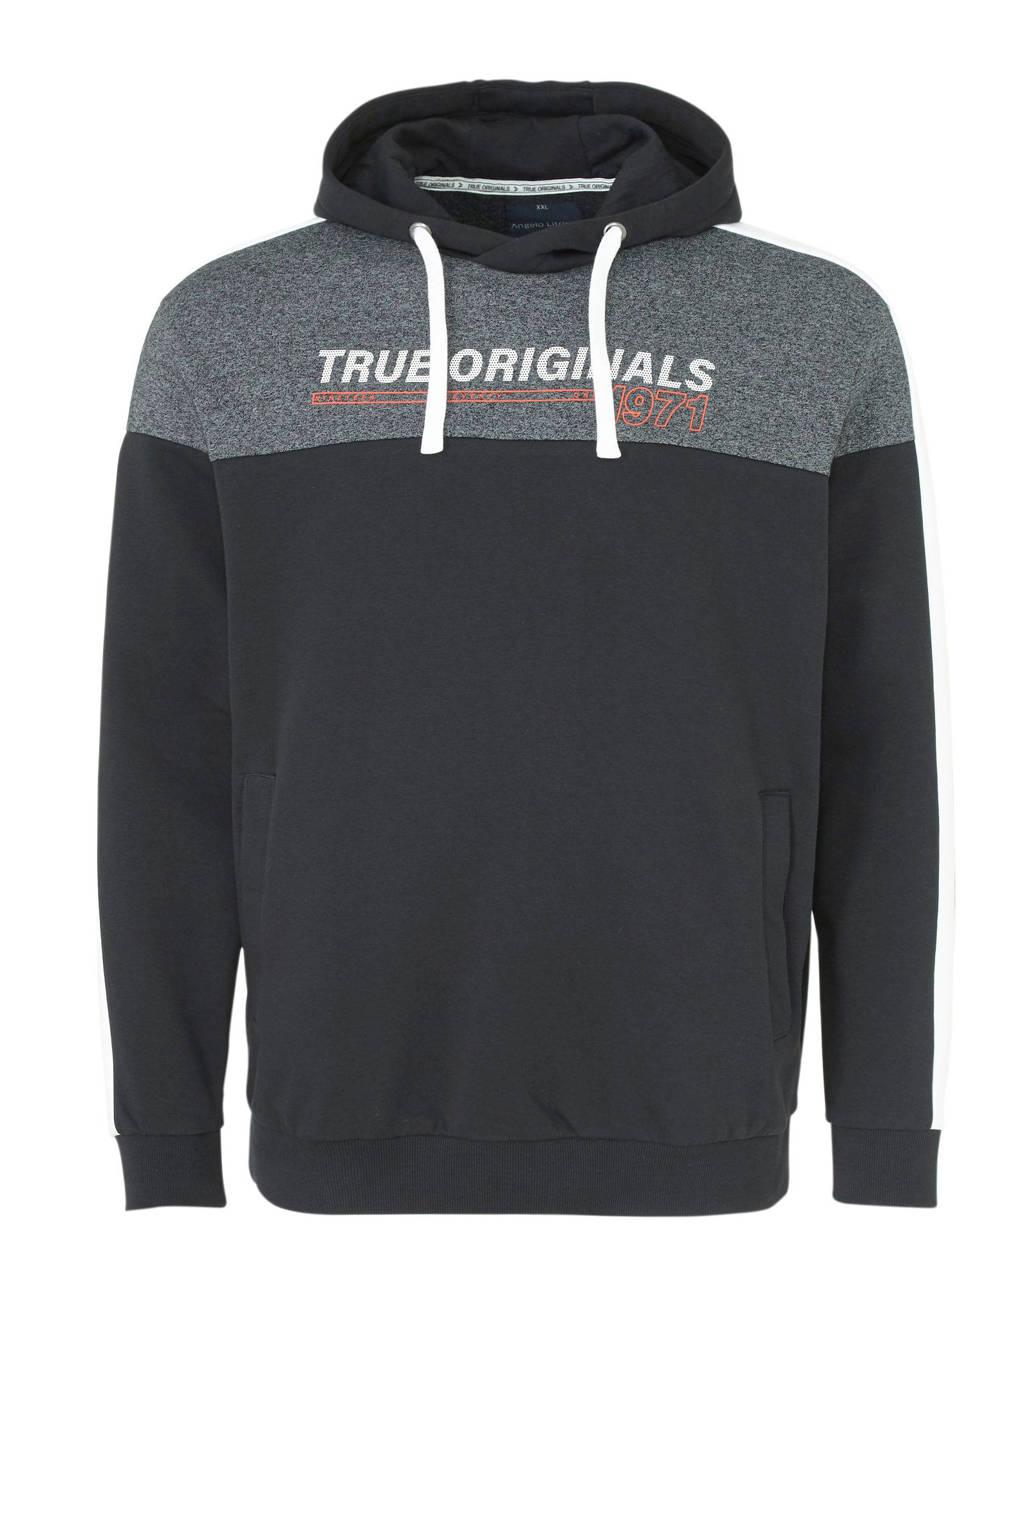 C&A XL Angelo Litrico hoodie met logo zwart, Zwart